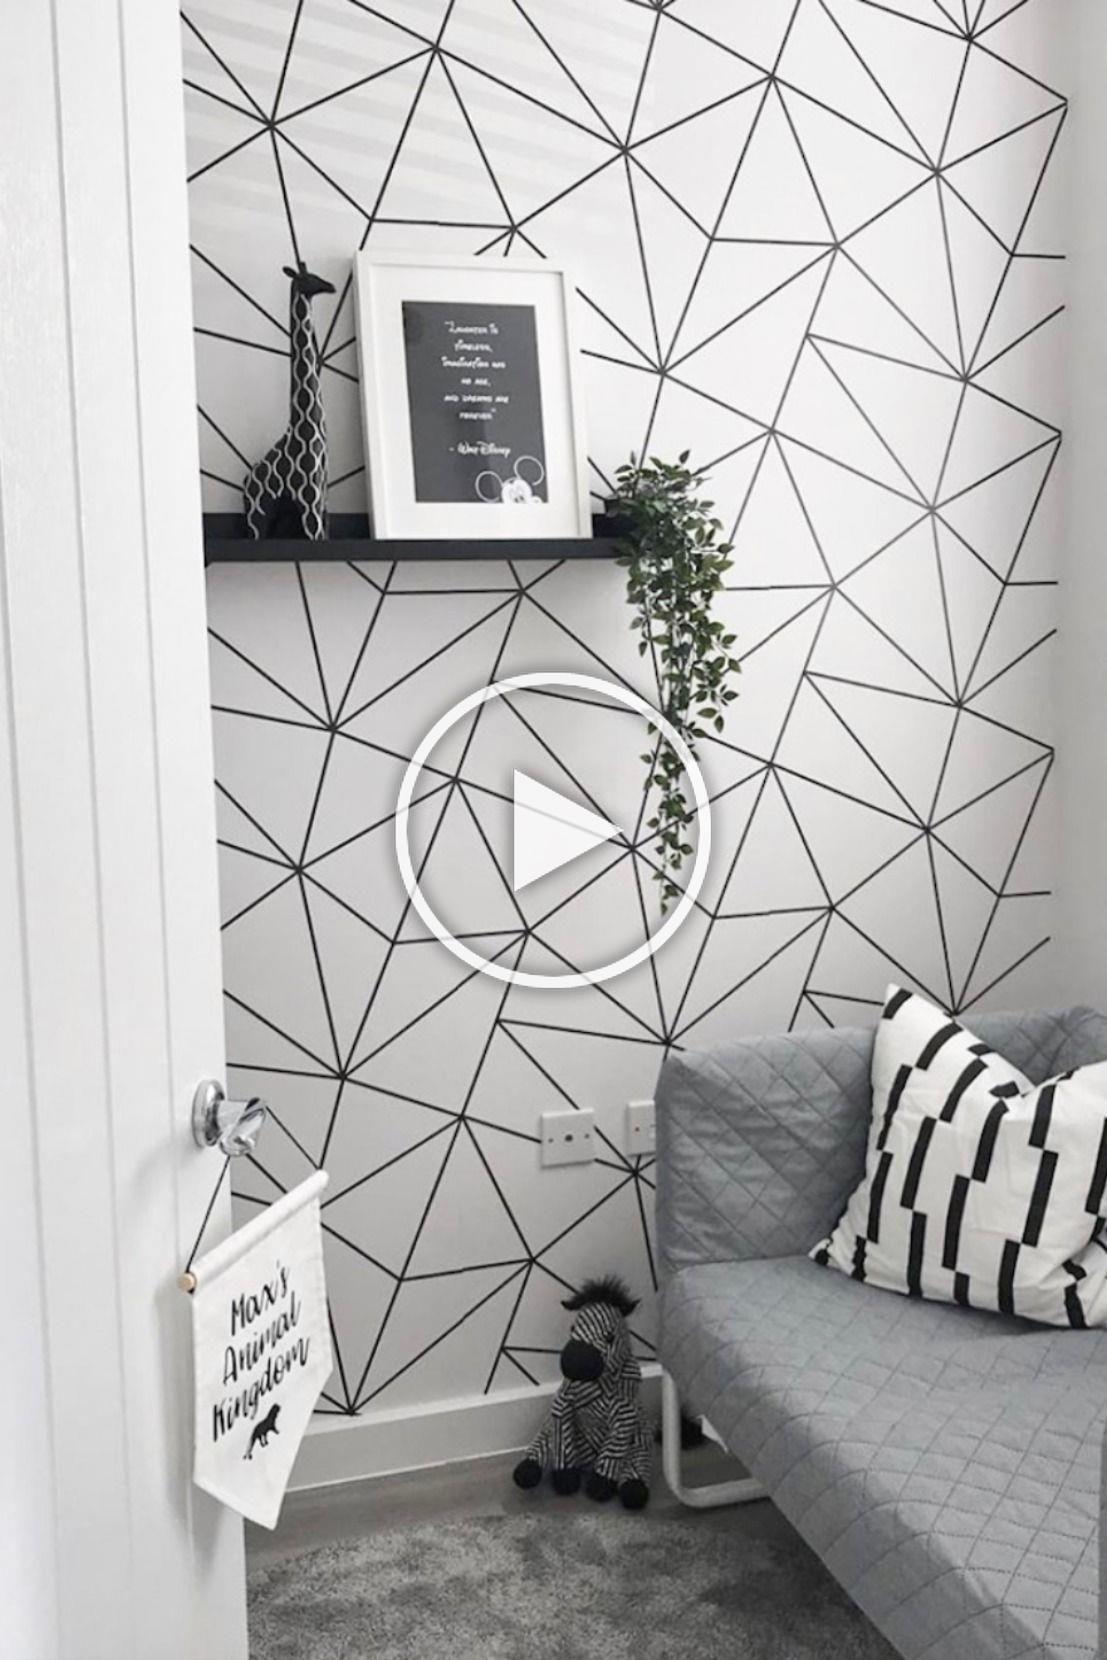 To Shop This Exclusive Design Visit Ilovewallpaper Co Uk Ilovewallpaper Homeinter Room Wallpaper Designs Geometric Wallpaper Living Room Bedroom Wall Designs